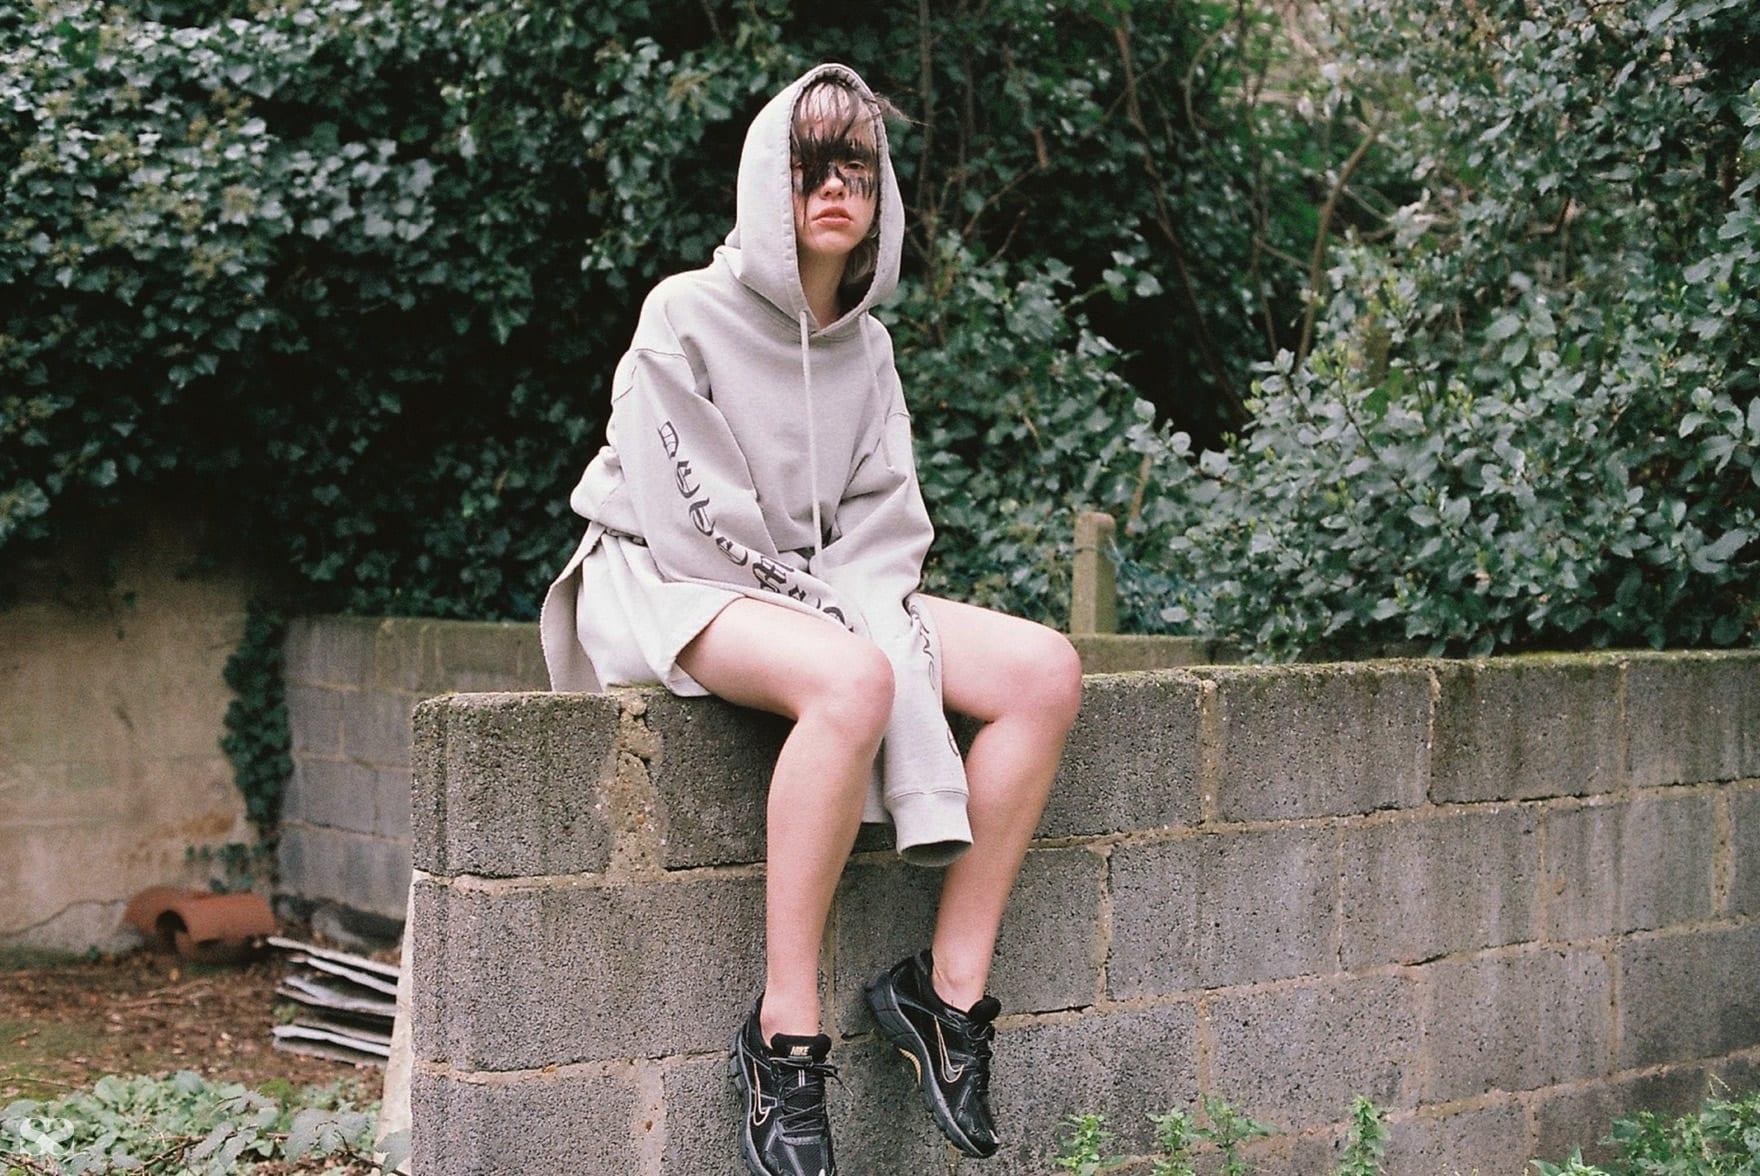 VETEMENTS jumper; model's own shoes.